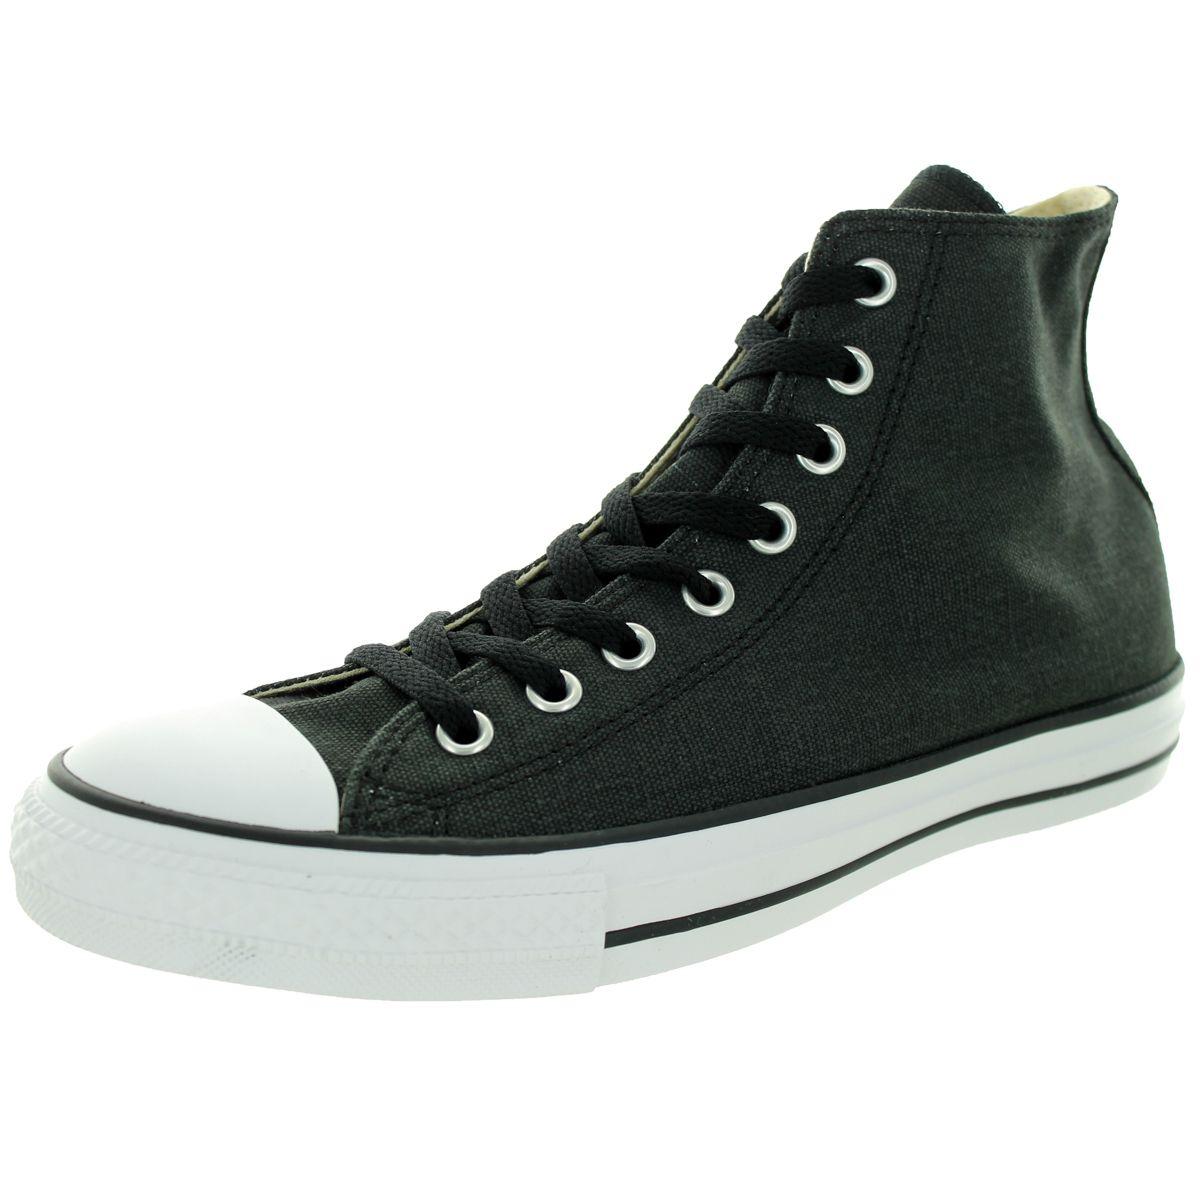 Converse Unisex Chuck Taylor Hi //Charcoal Basketball Shoe